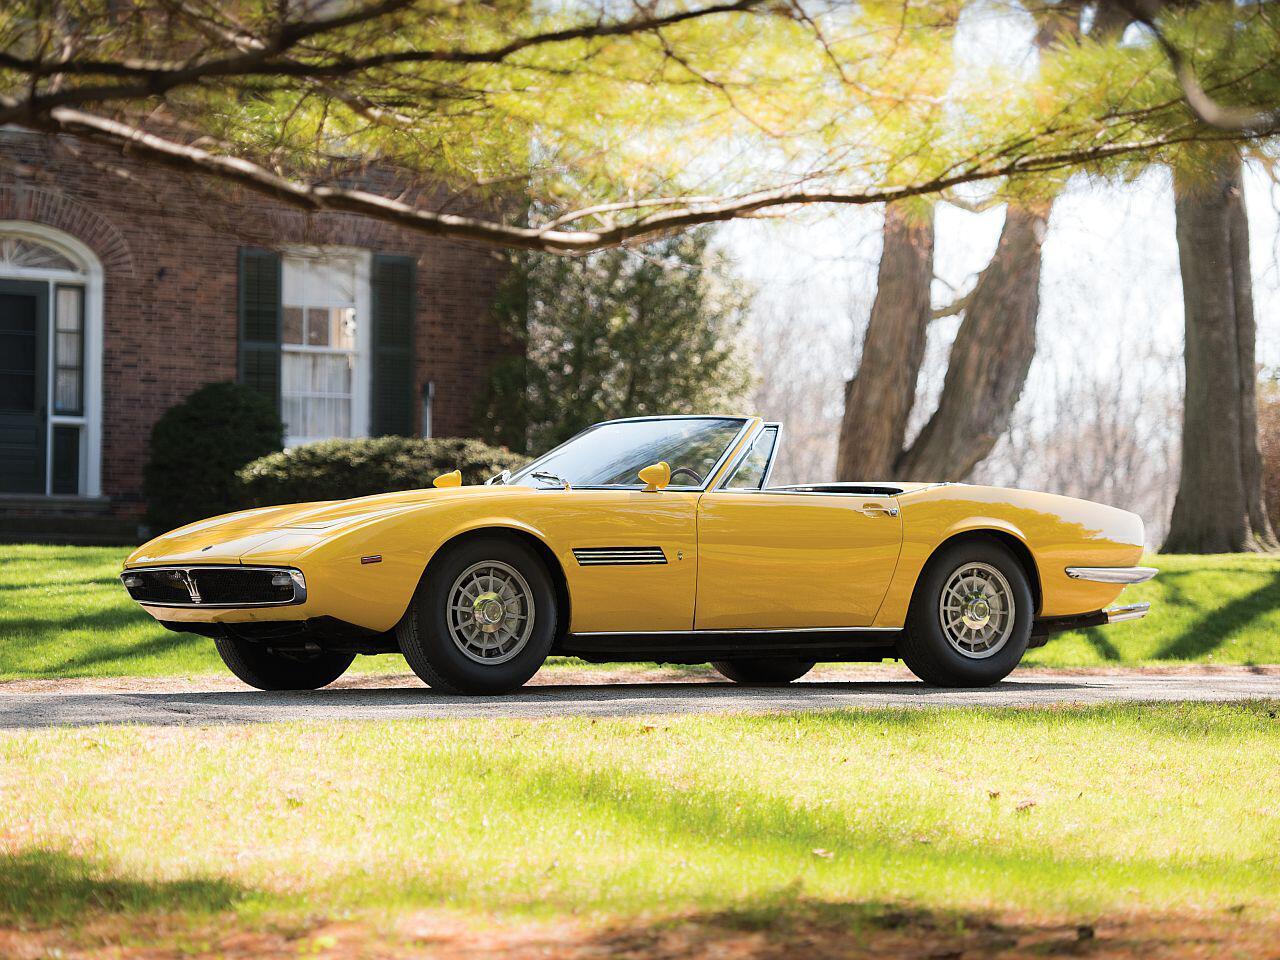 Bild zu 1968 Maserati Ghibli Spyder Prototype by Ghia